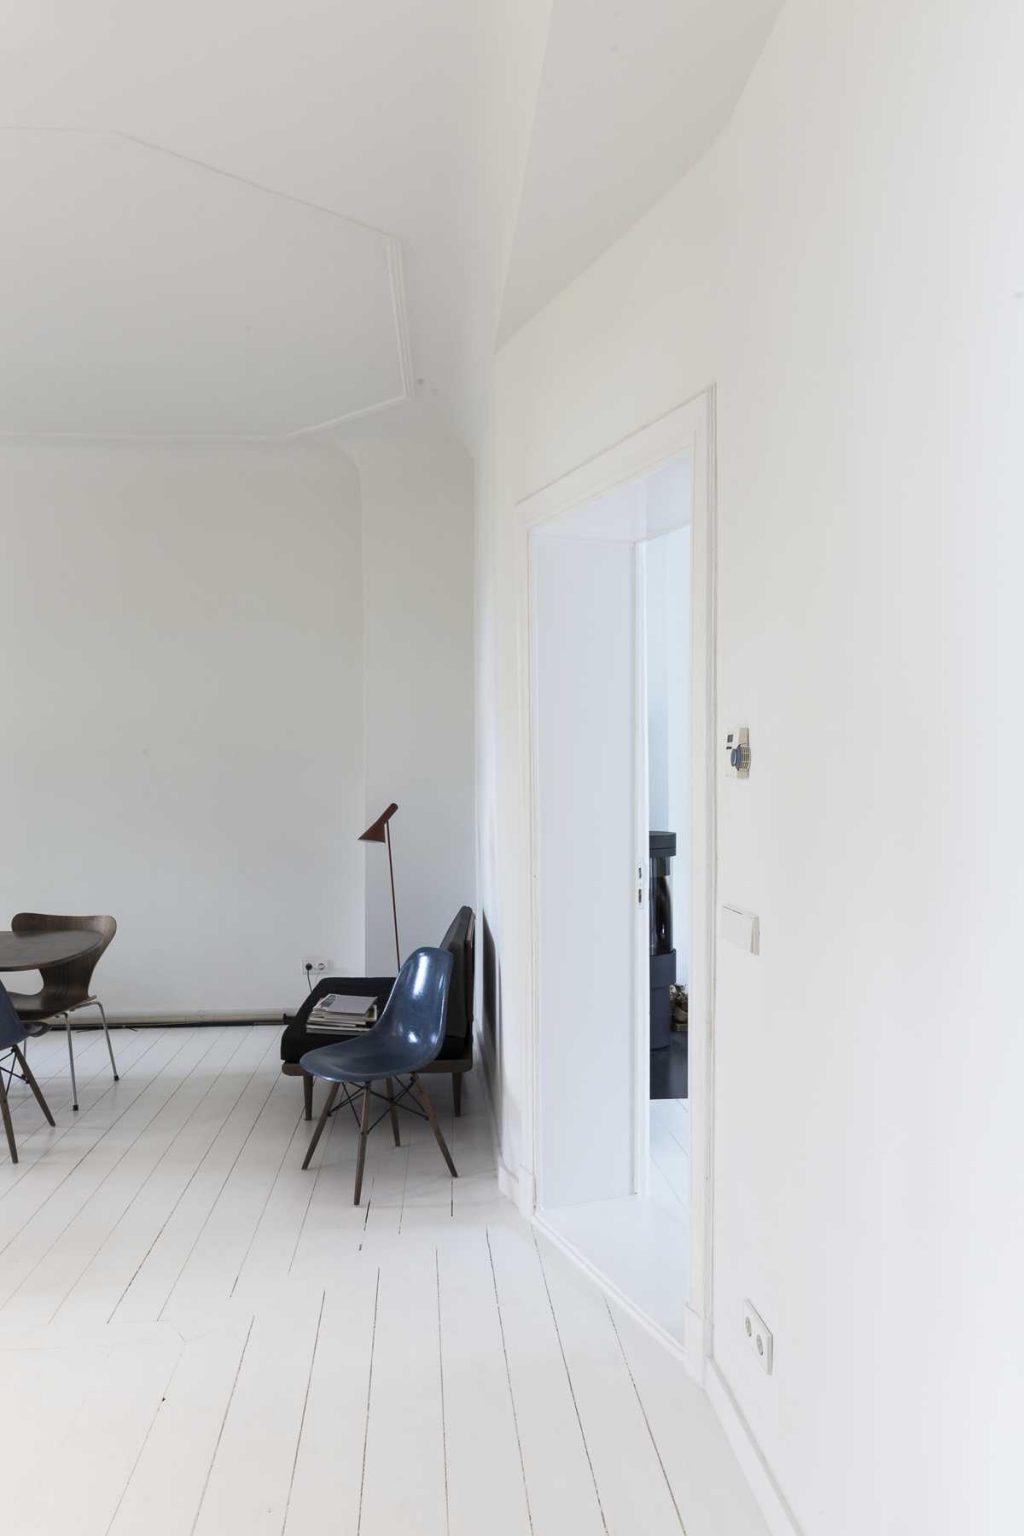 Minimalist apartment renovation in Berlin by ALLENKAUFMANN